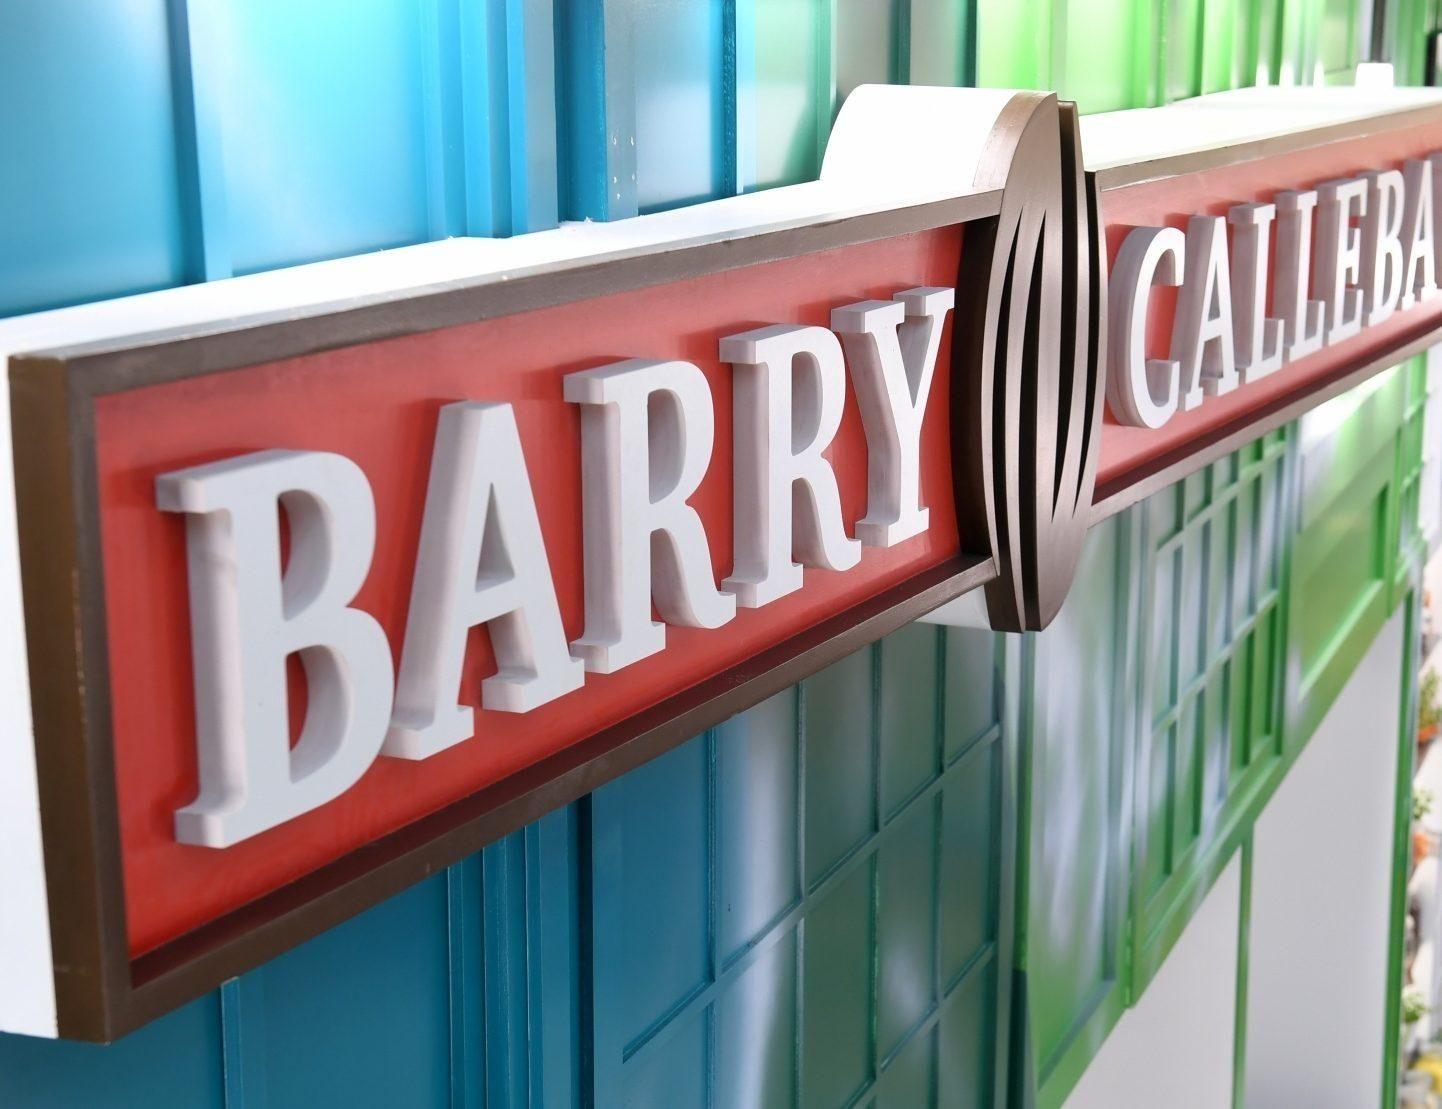 About Barry Callebaut FSI12